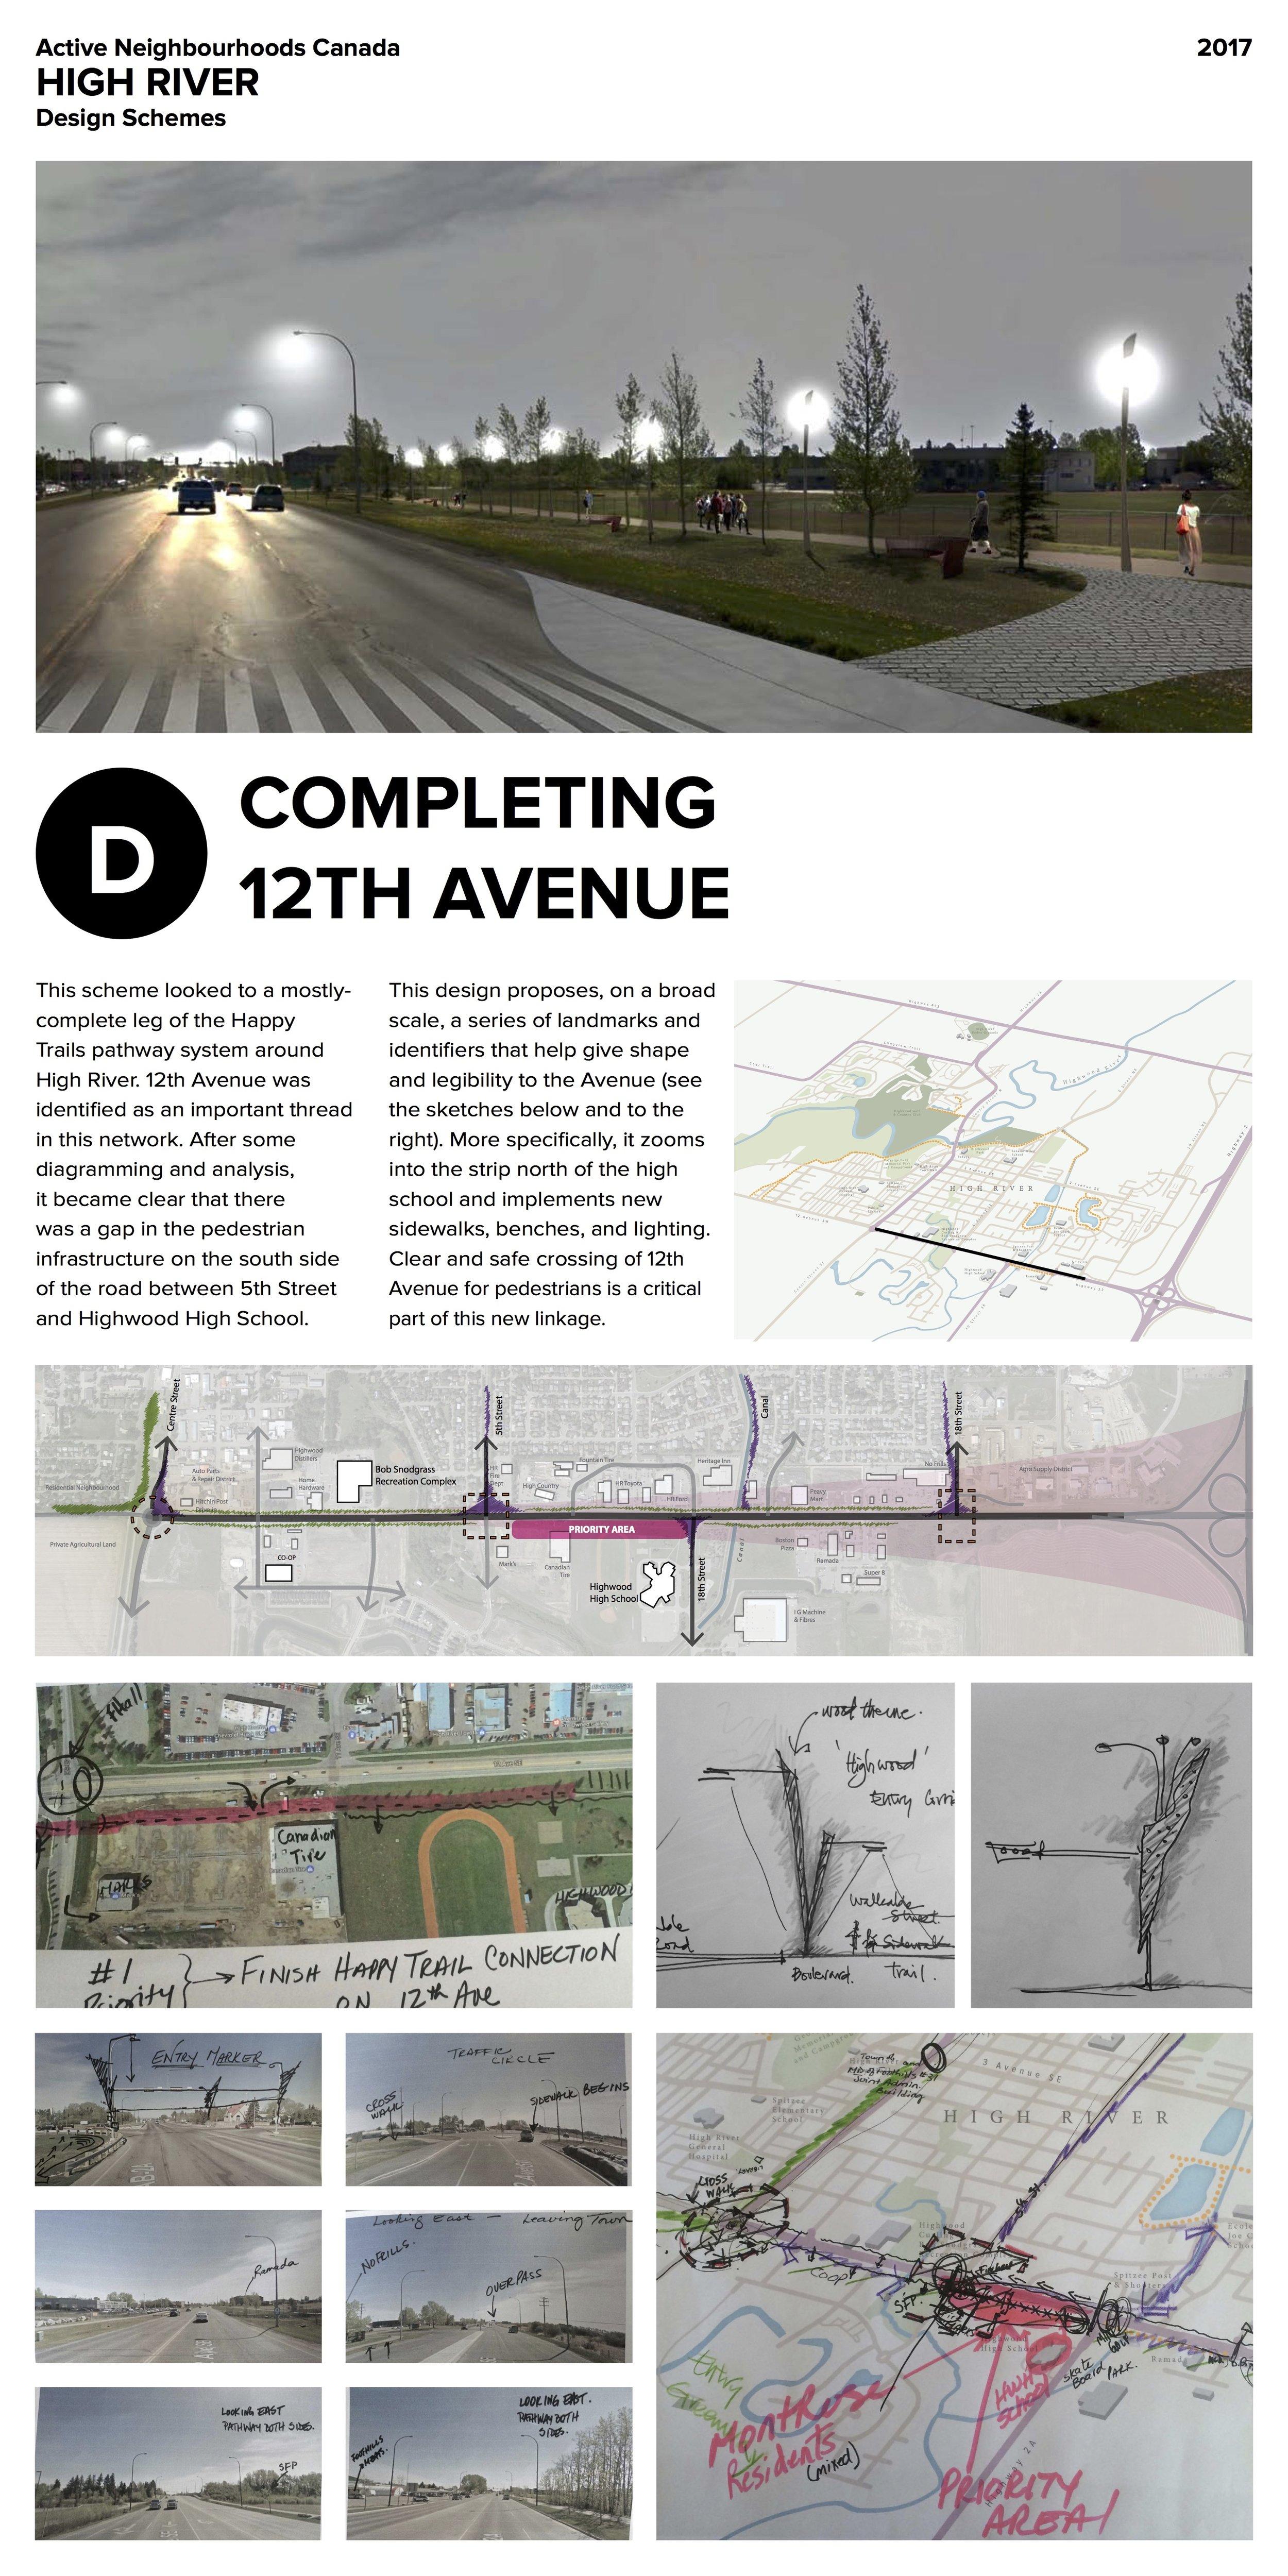 High River Schemes page 5.jpg